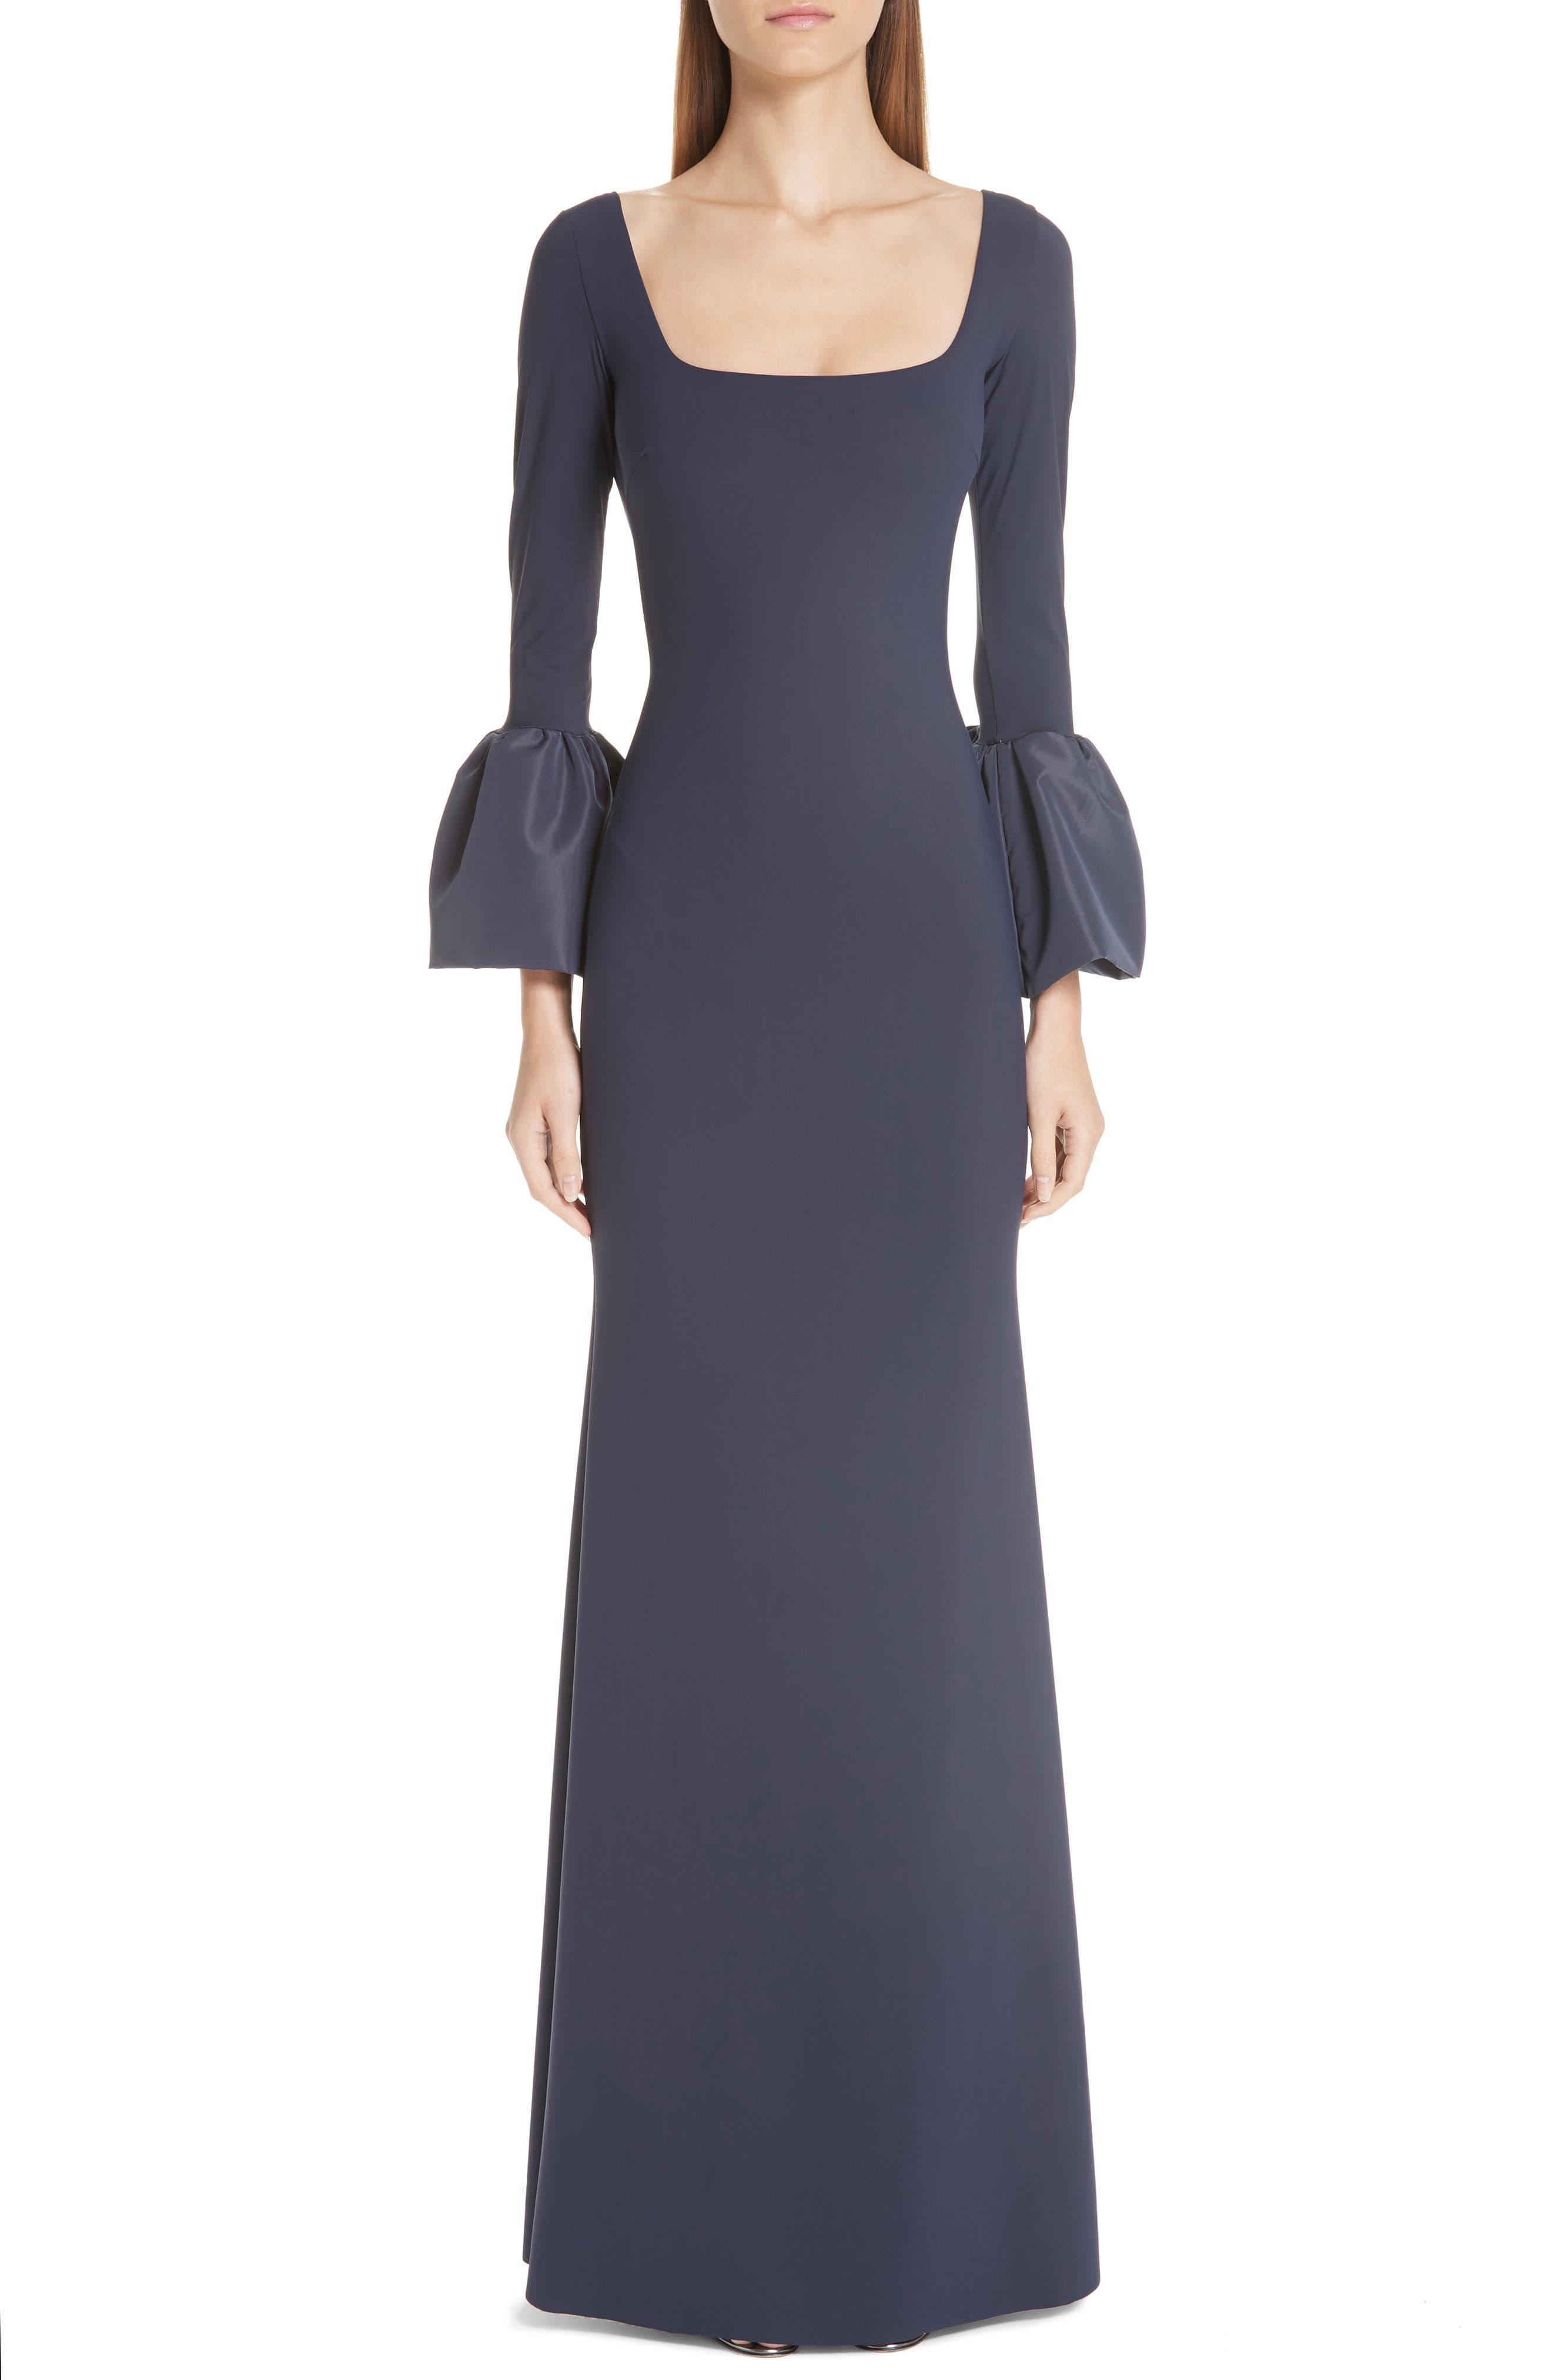 Chiara Boni La Petite Robe Aarymalda Bell Sleeve Gown, 8 IT - Blue